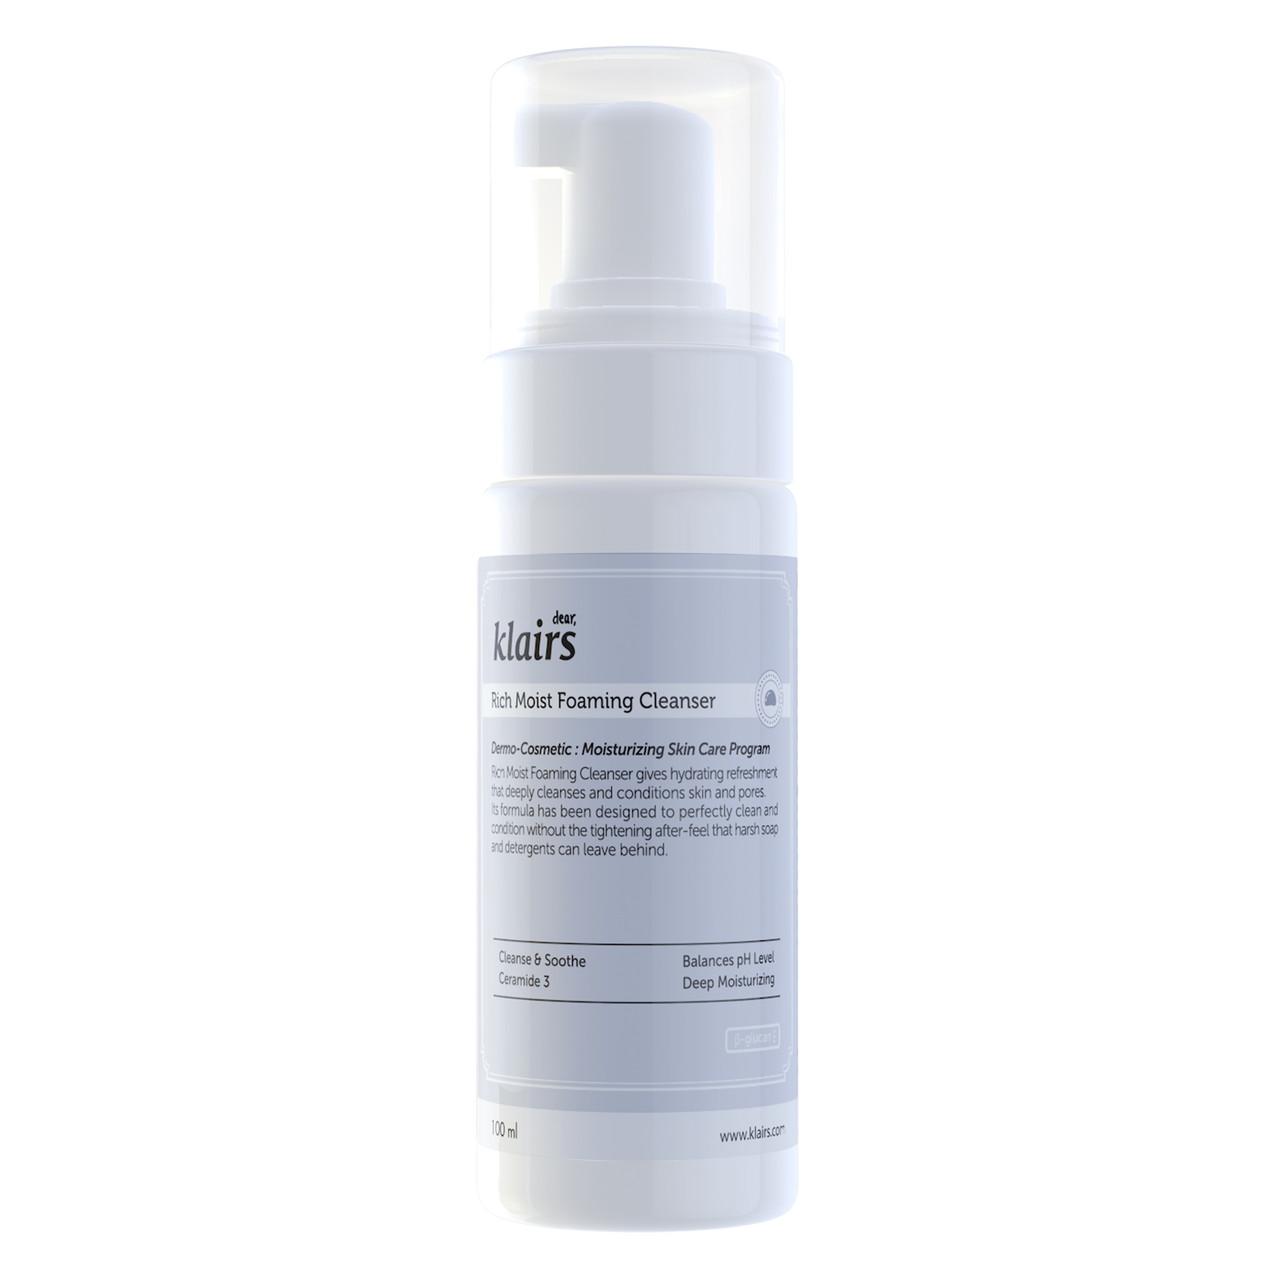 Klairs Rich Moist Foaming Cleanser Гипоаллергенная очищающая пенка с бета глюканом